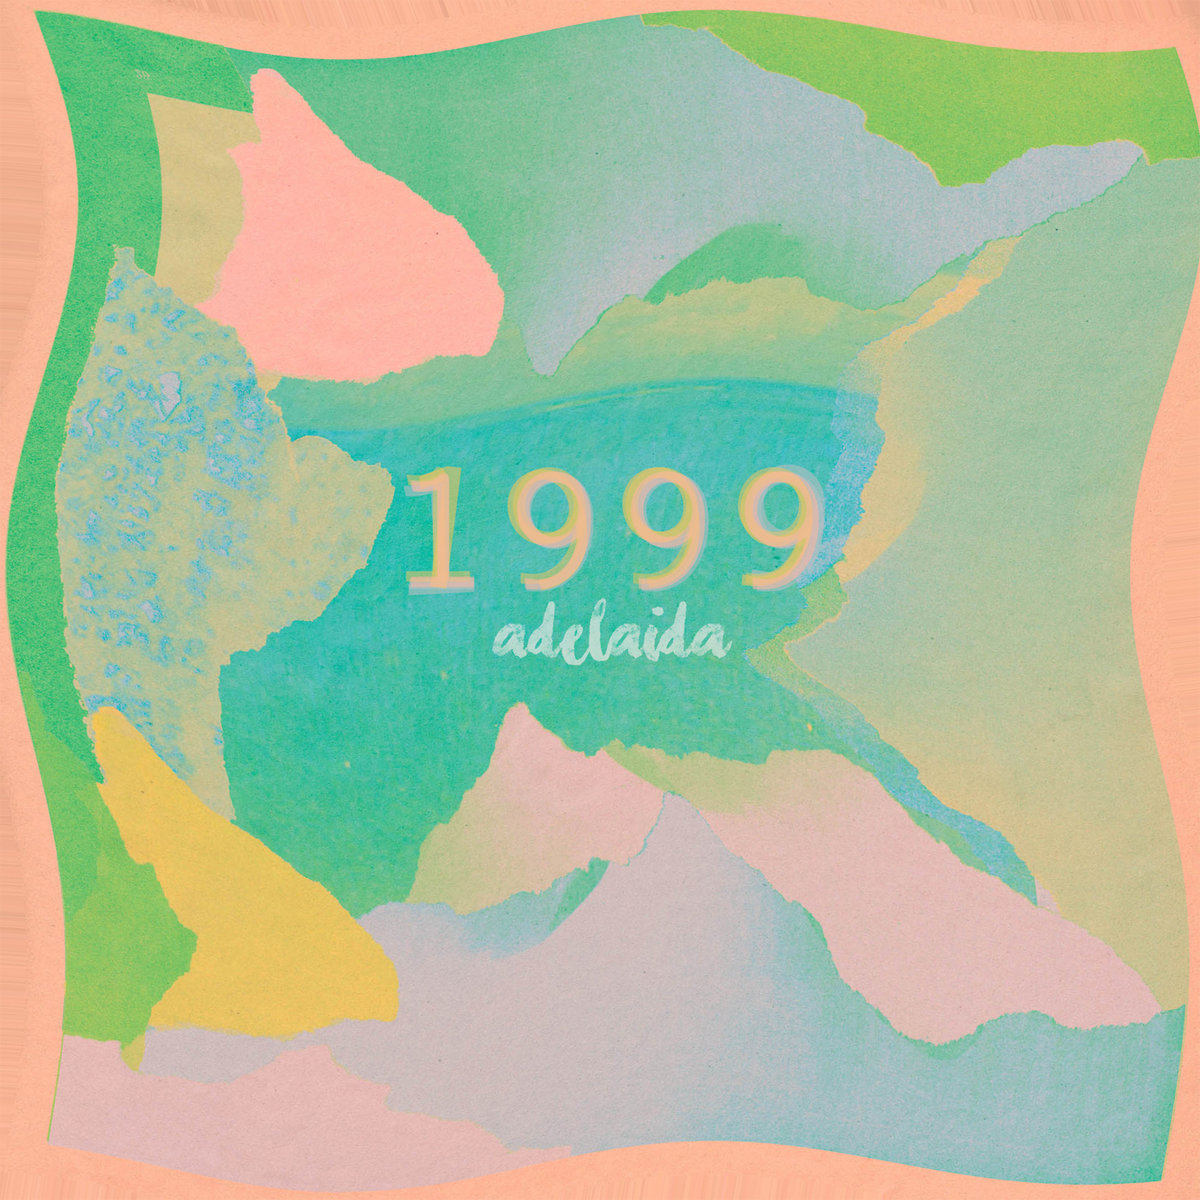 Resultado de imagen para adelaida 1999